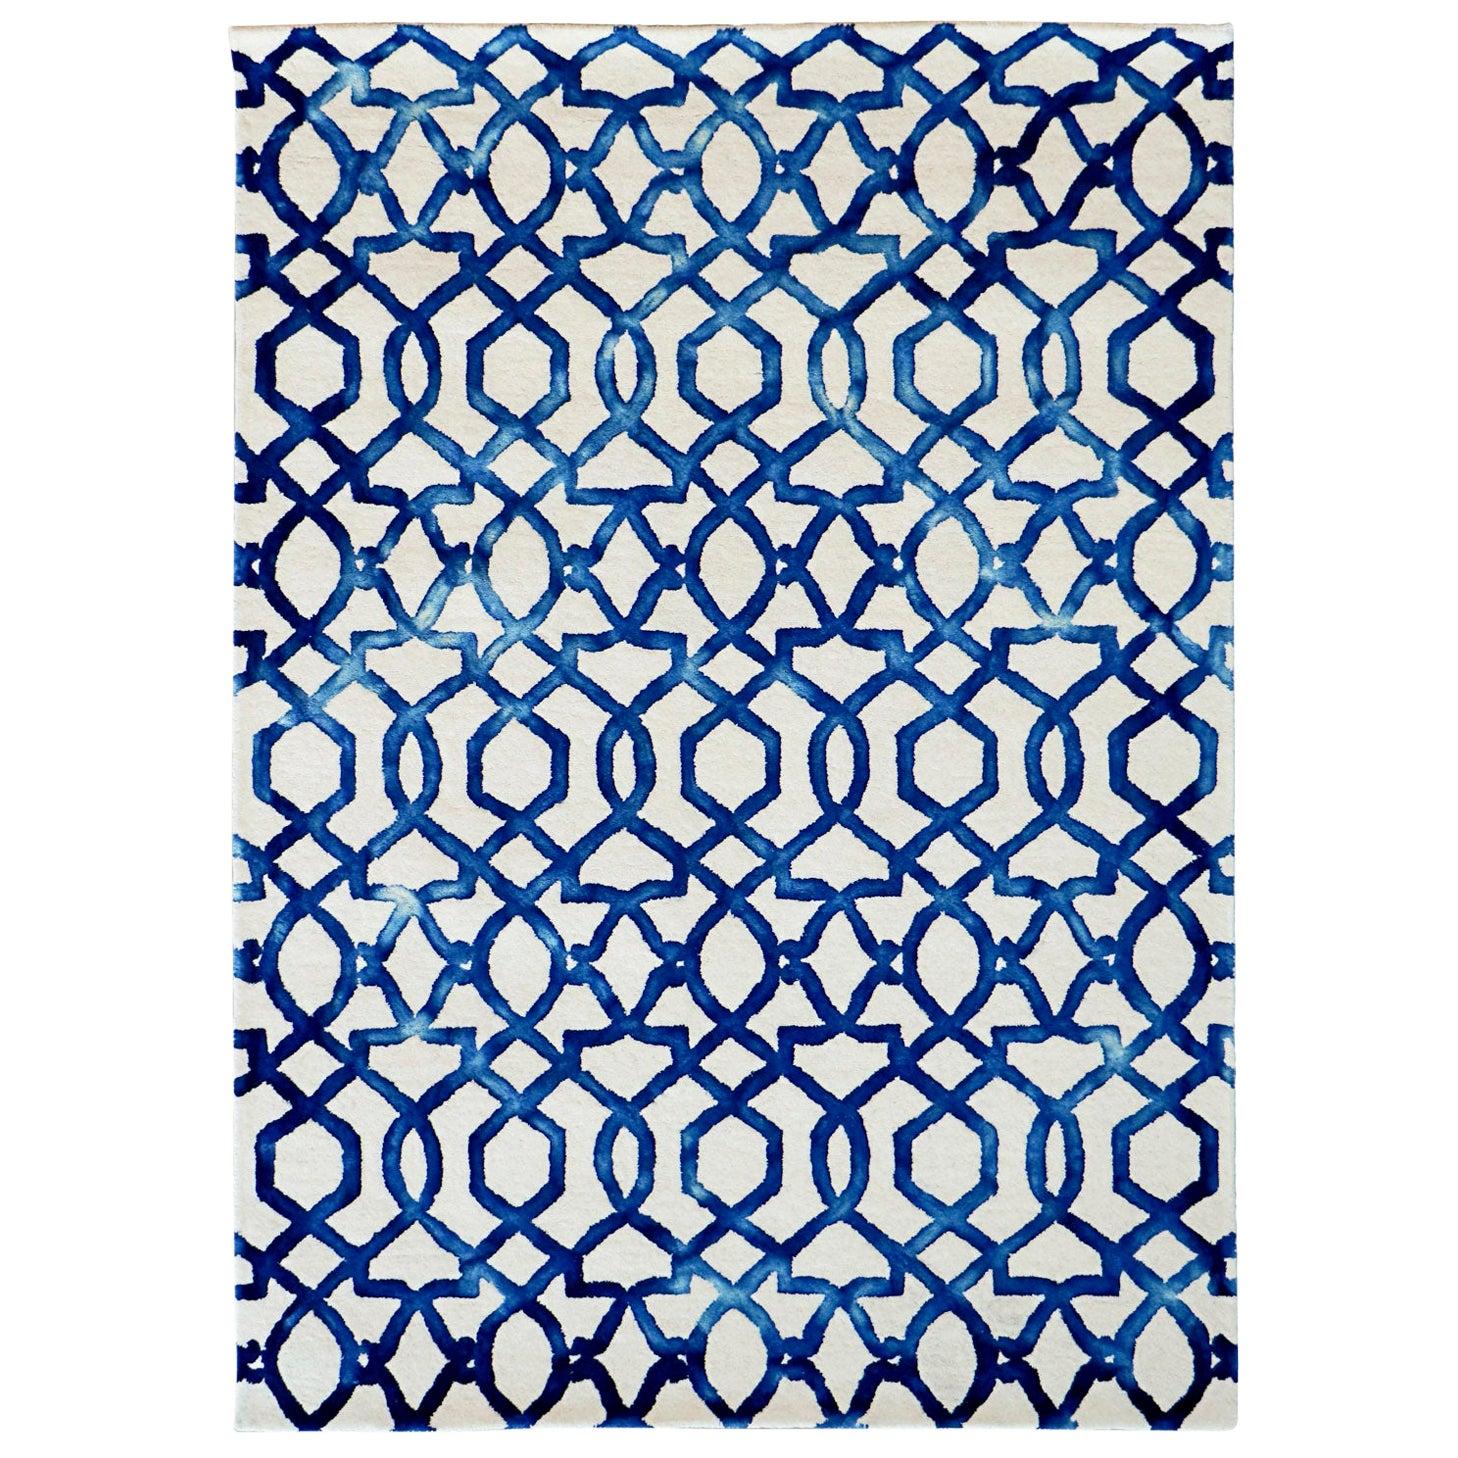 Casablanca Hand Woven Modern Rug New Zealand Wool by Deanna Comellini 140x200 cm